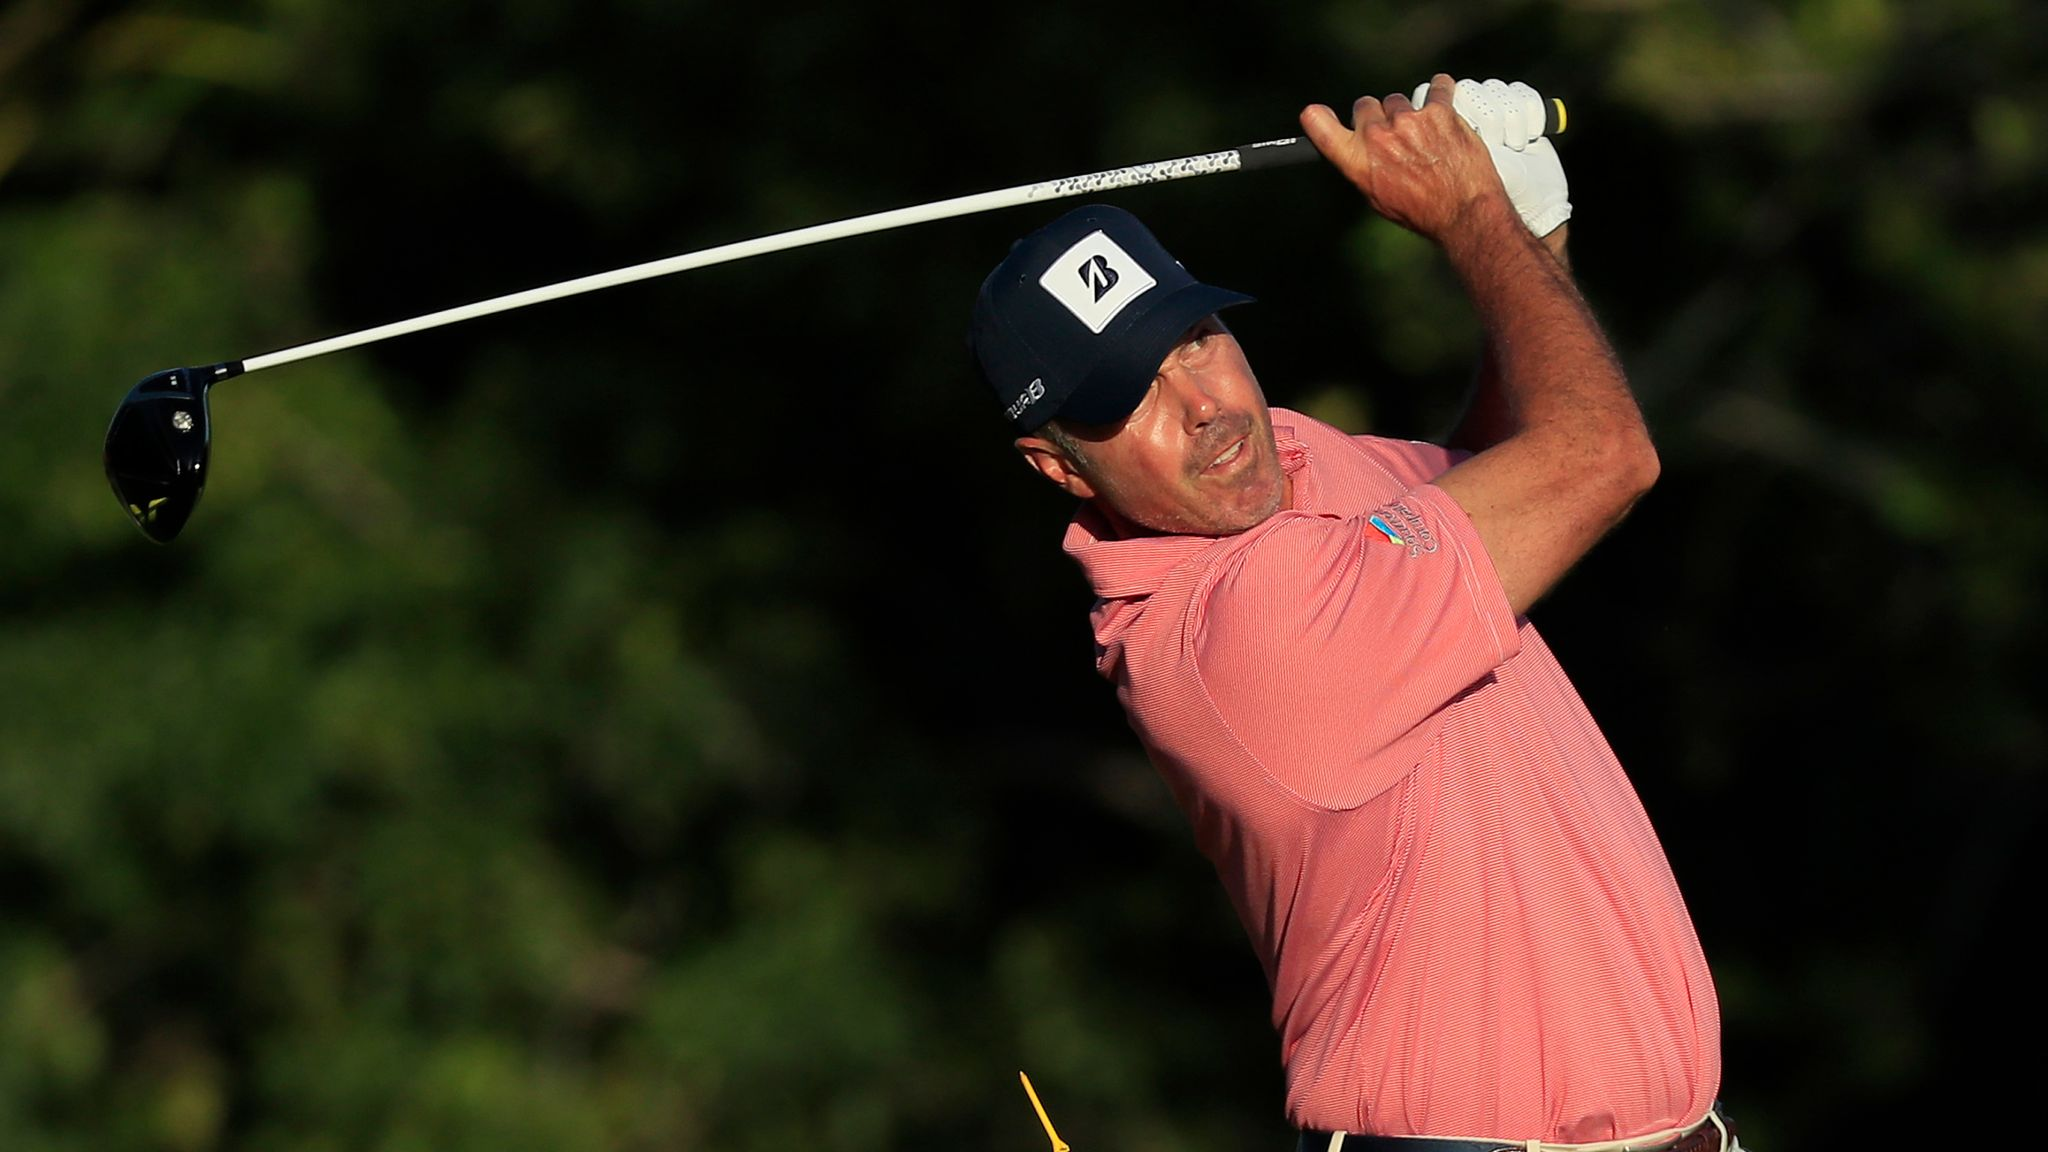 Mayakoba Golf Classic: Matt Kuchar makes hole-in-one in Mexico